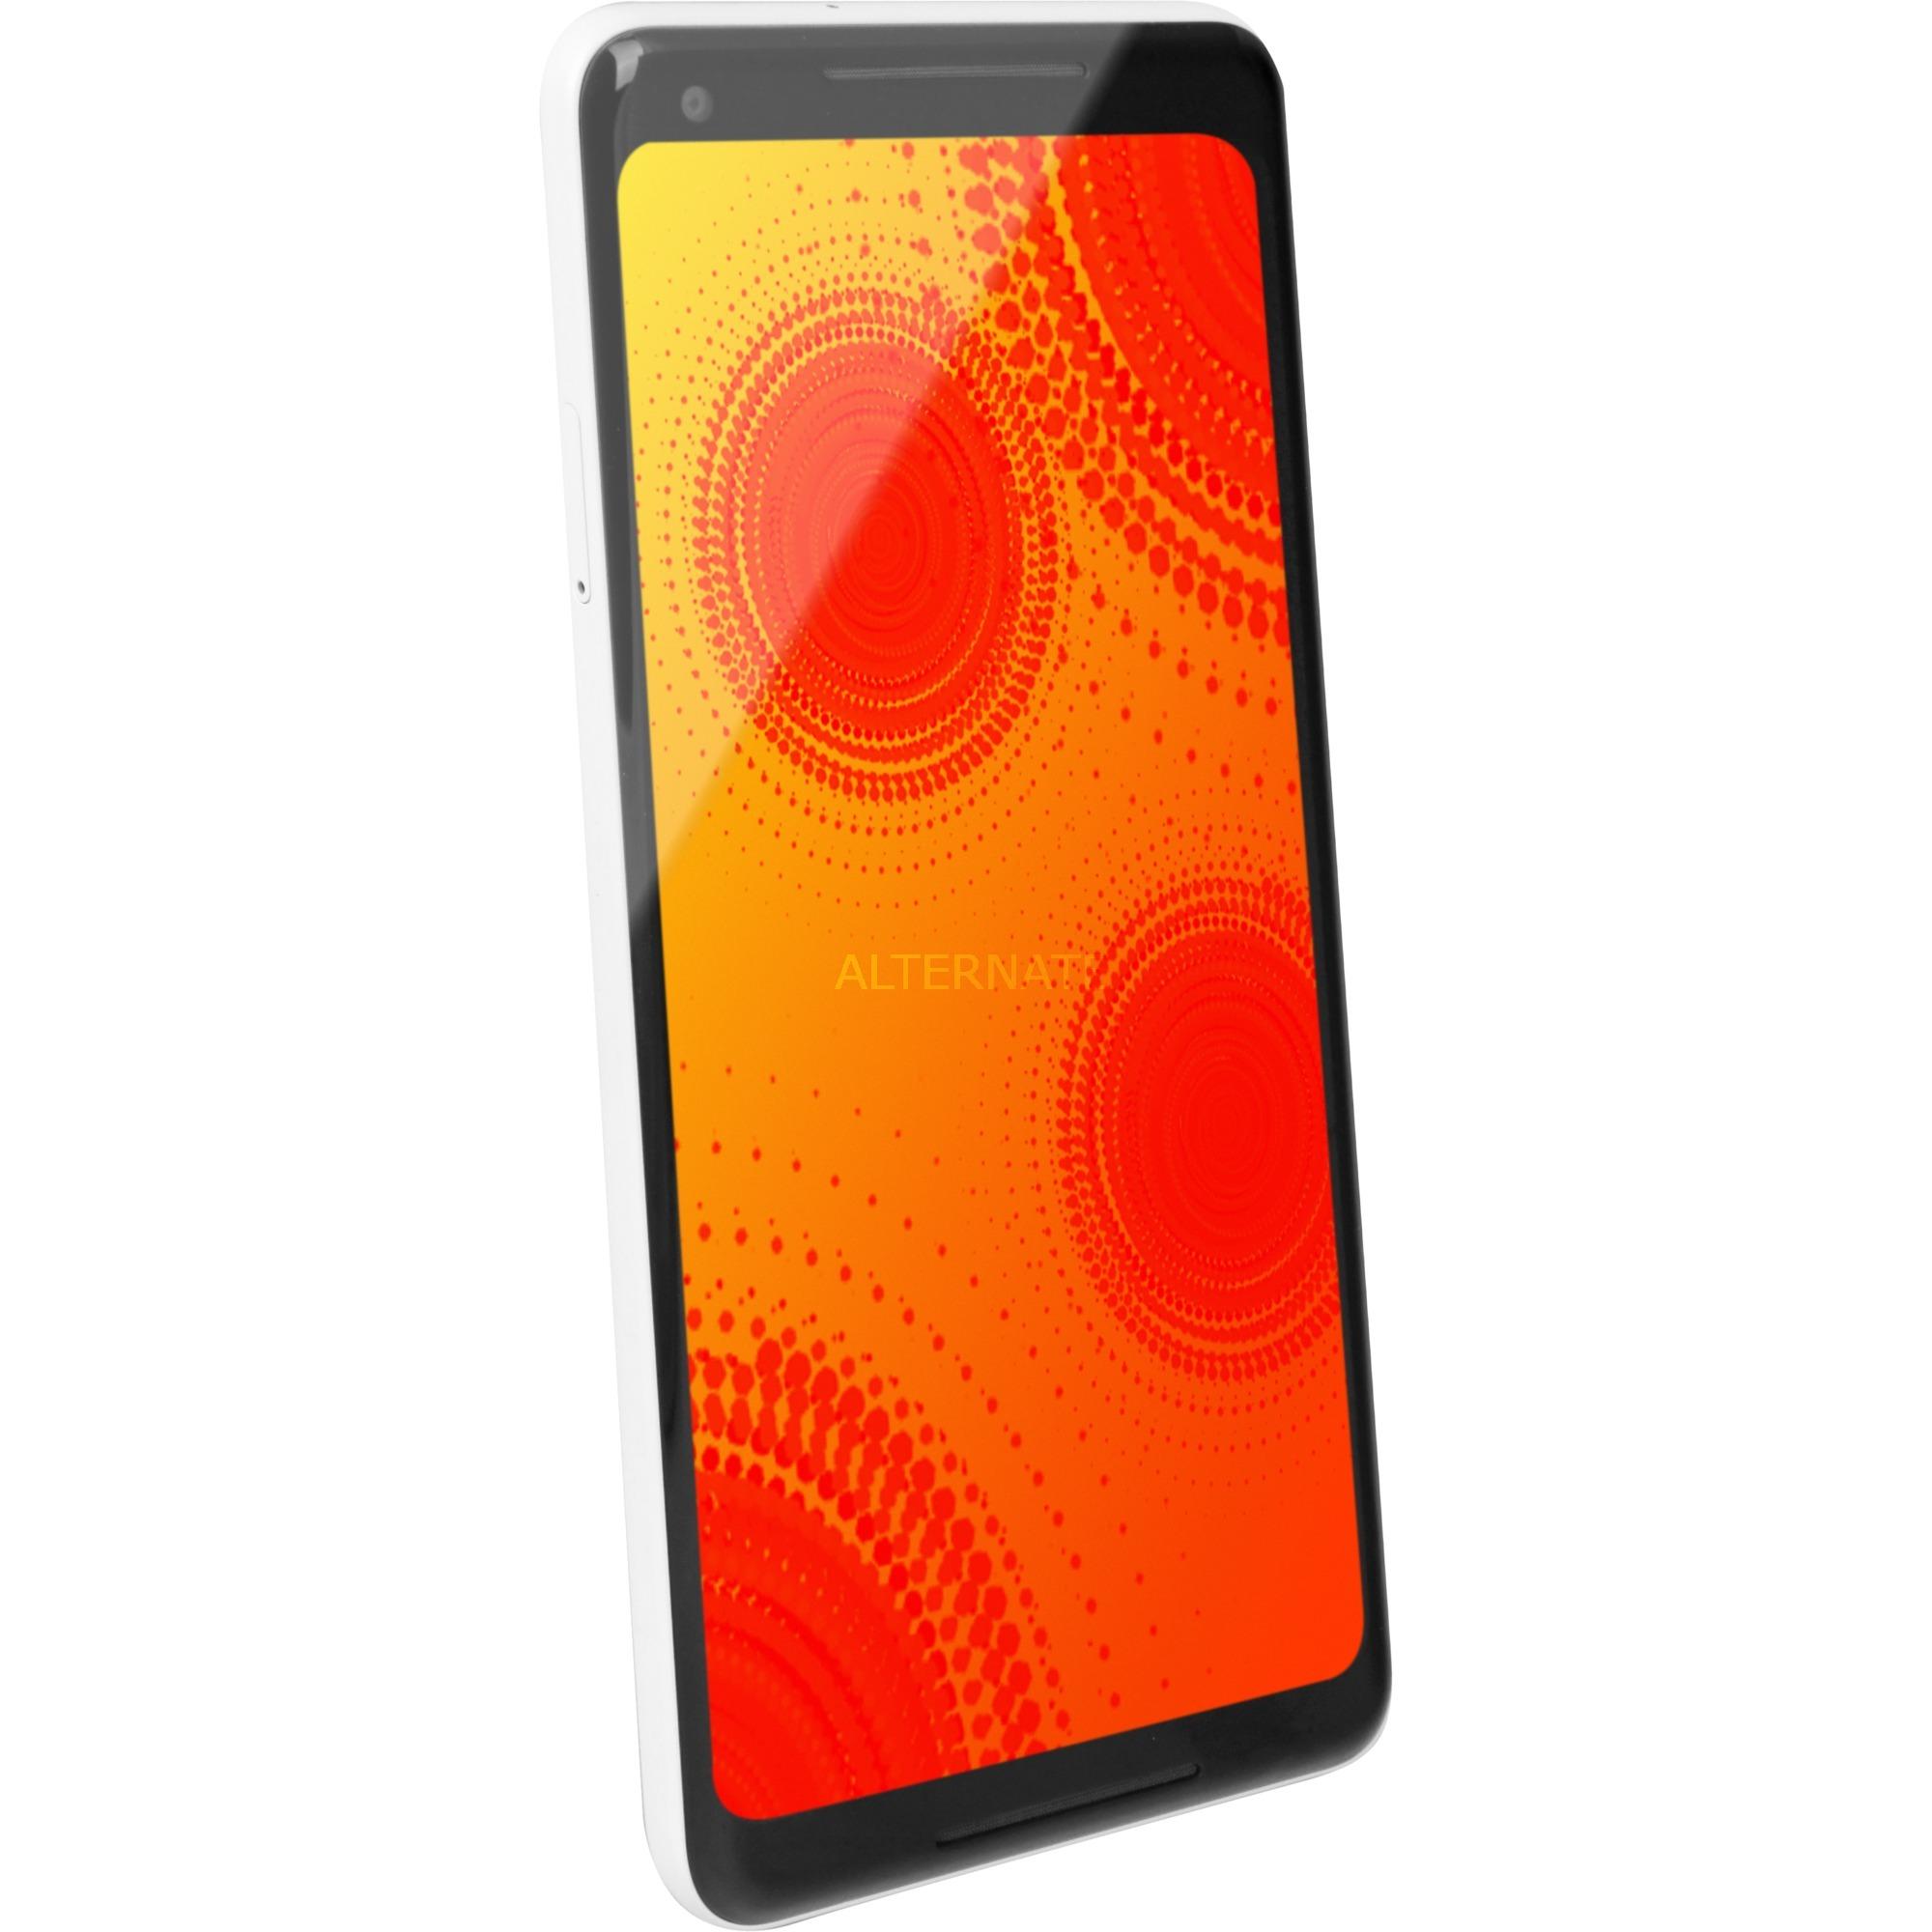 "Pixel 2 XL 15,2 cm (6"") 4 GB 64 GB SIM única 4G Negro, Blanco 3520 mAh, Móvil"